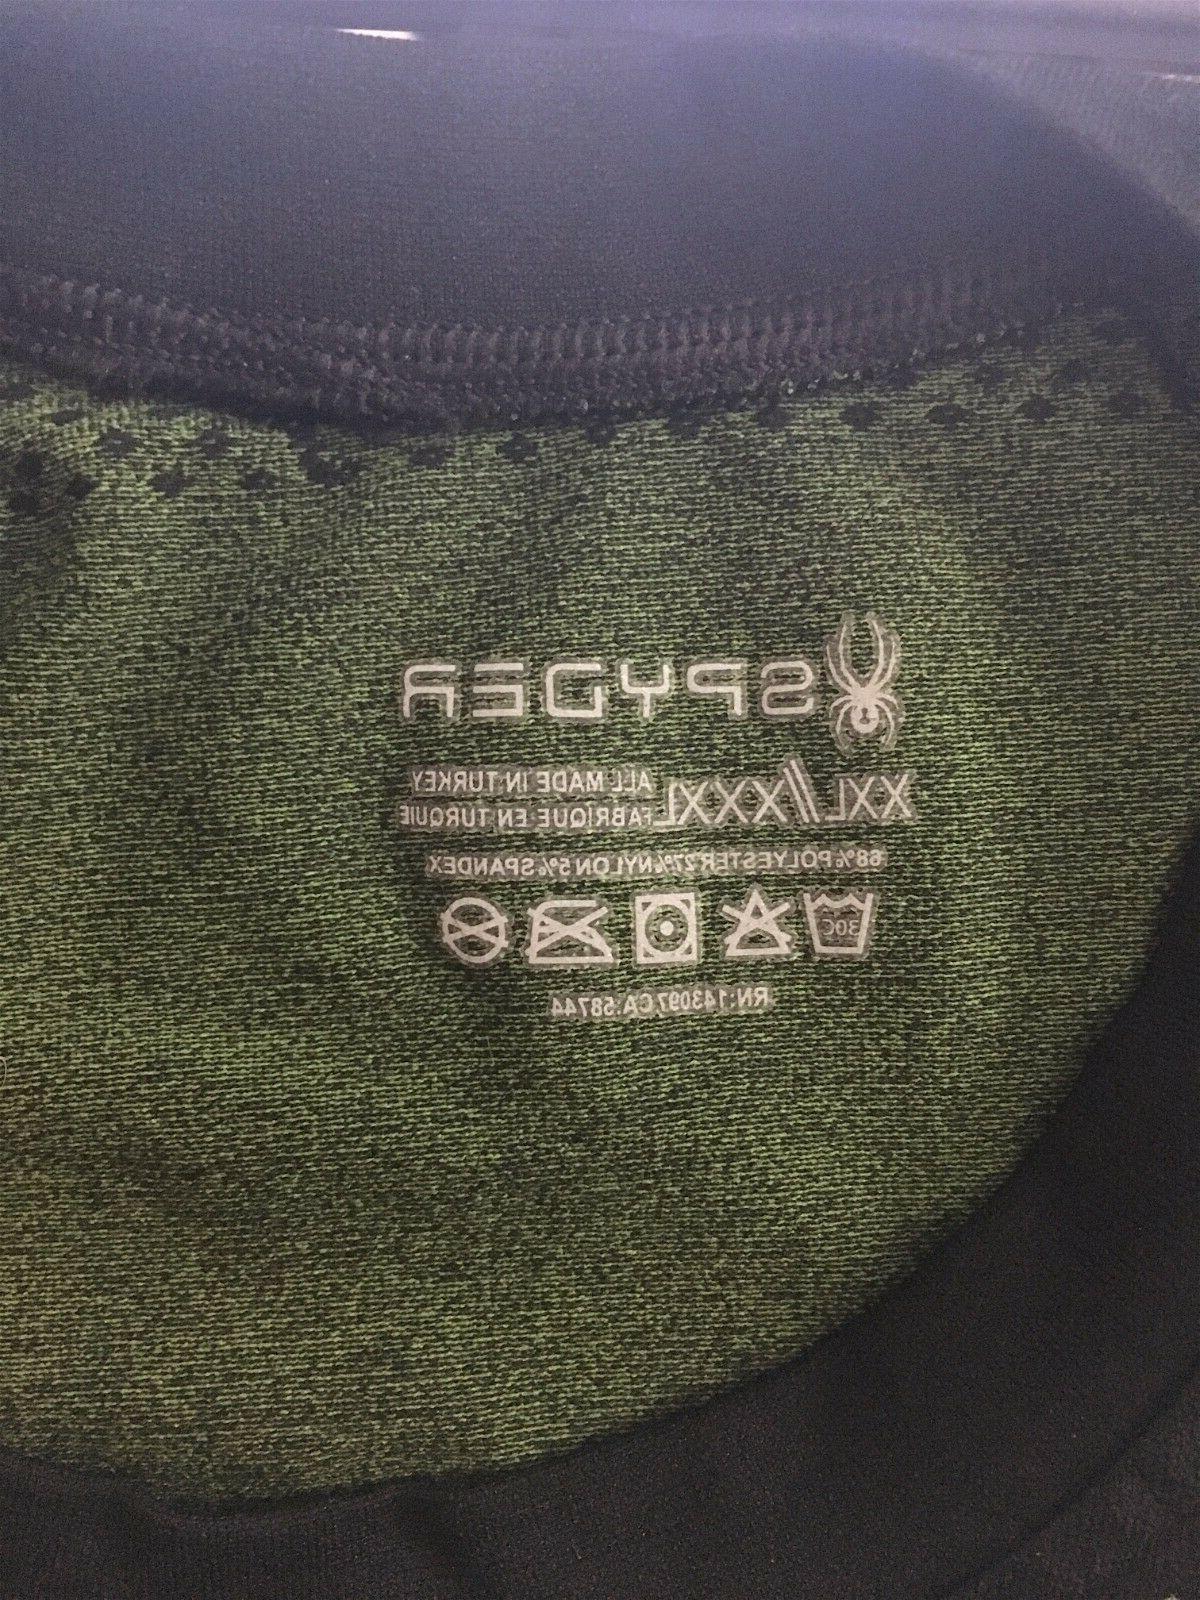 Spyder Thermal sleeve